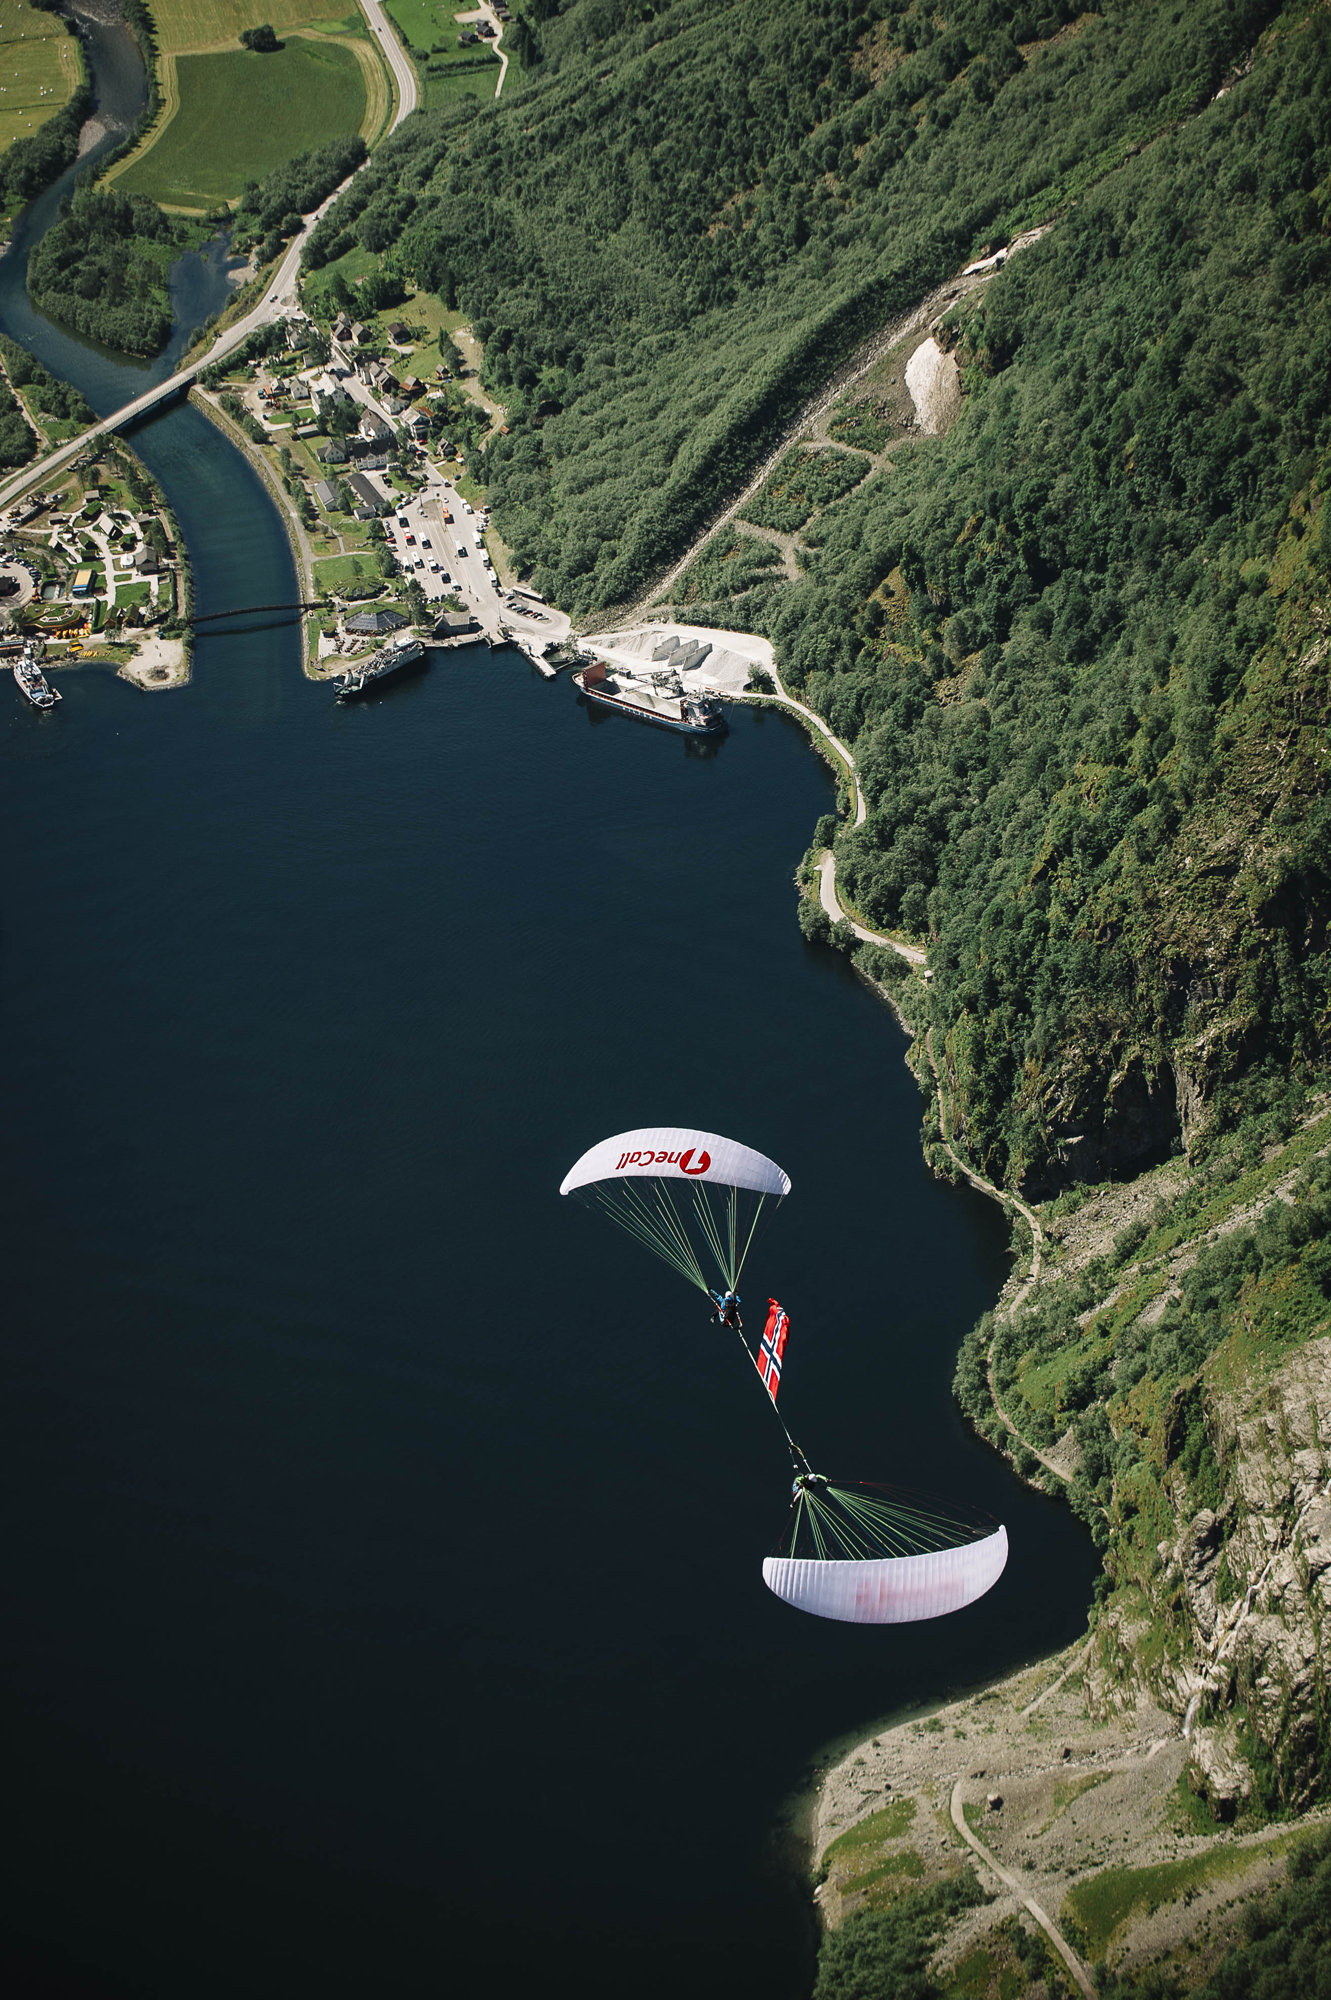 Norway Flag paragliding down plane Francois Ragolski Martin Schricke Gudvengen Picx by Emil Sollie 5